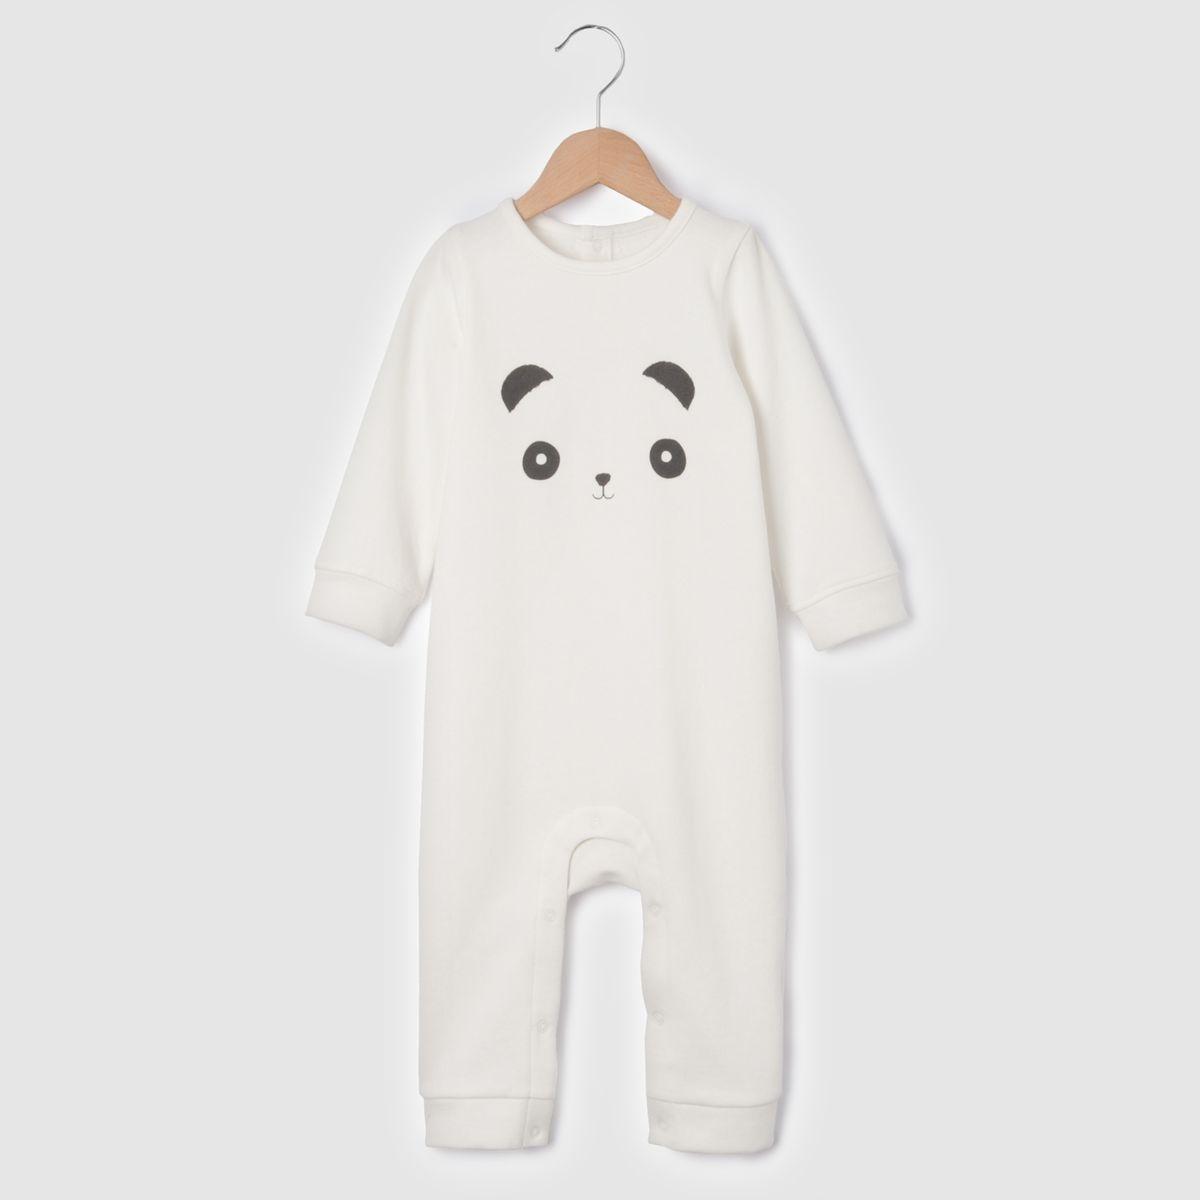 Combinaison bébé Oeko Tex